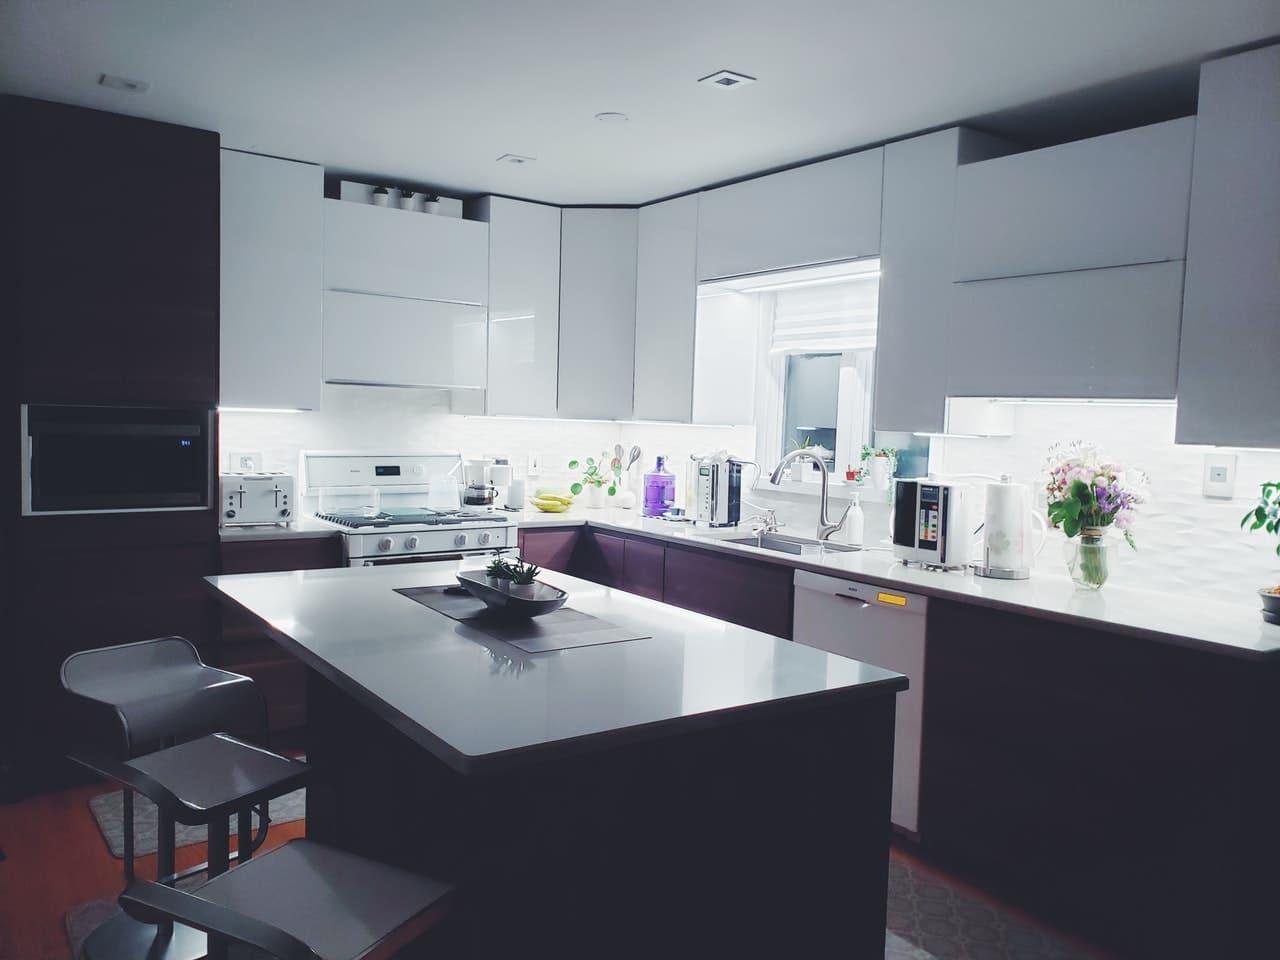 rectangular-white-island-table-in-kitchen-2398375